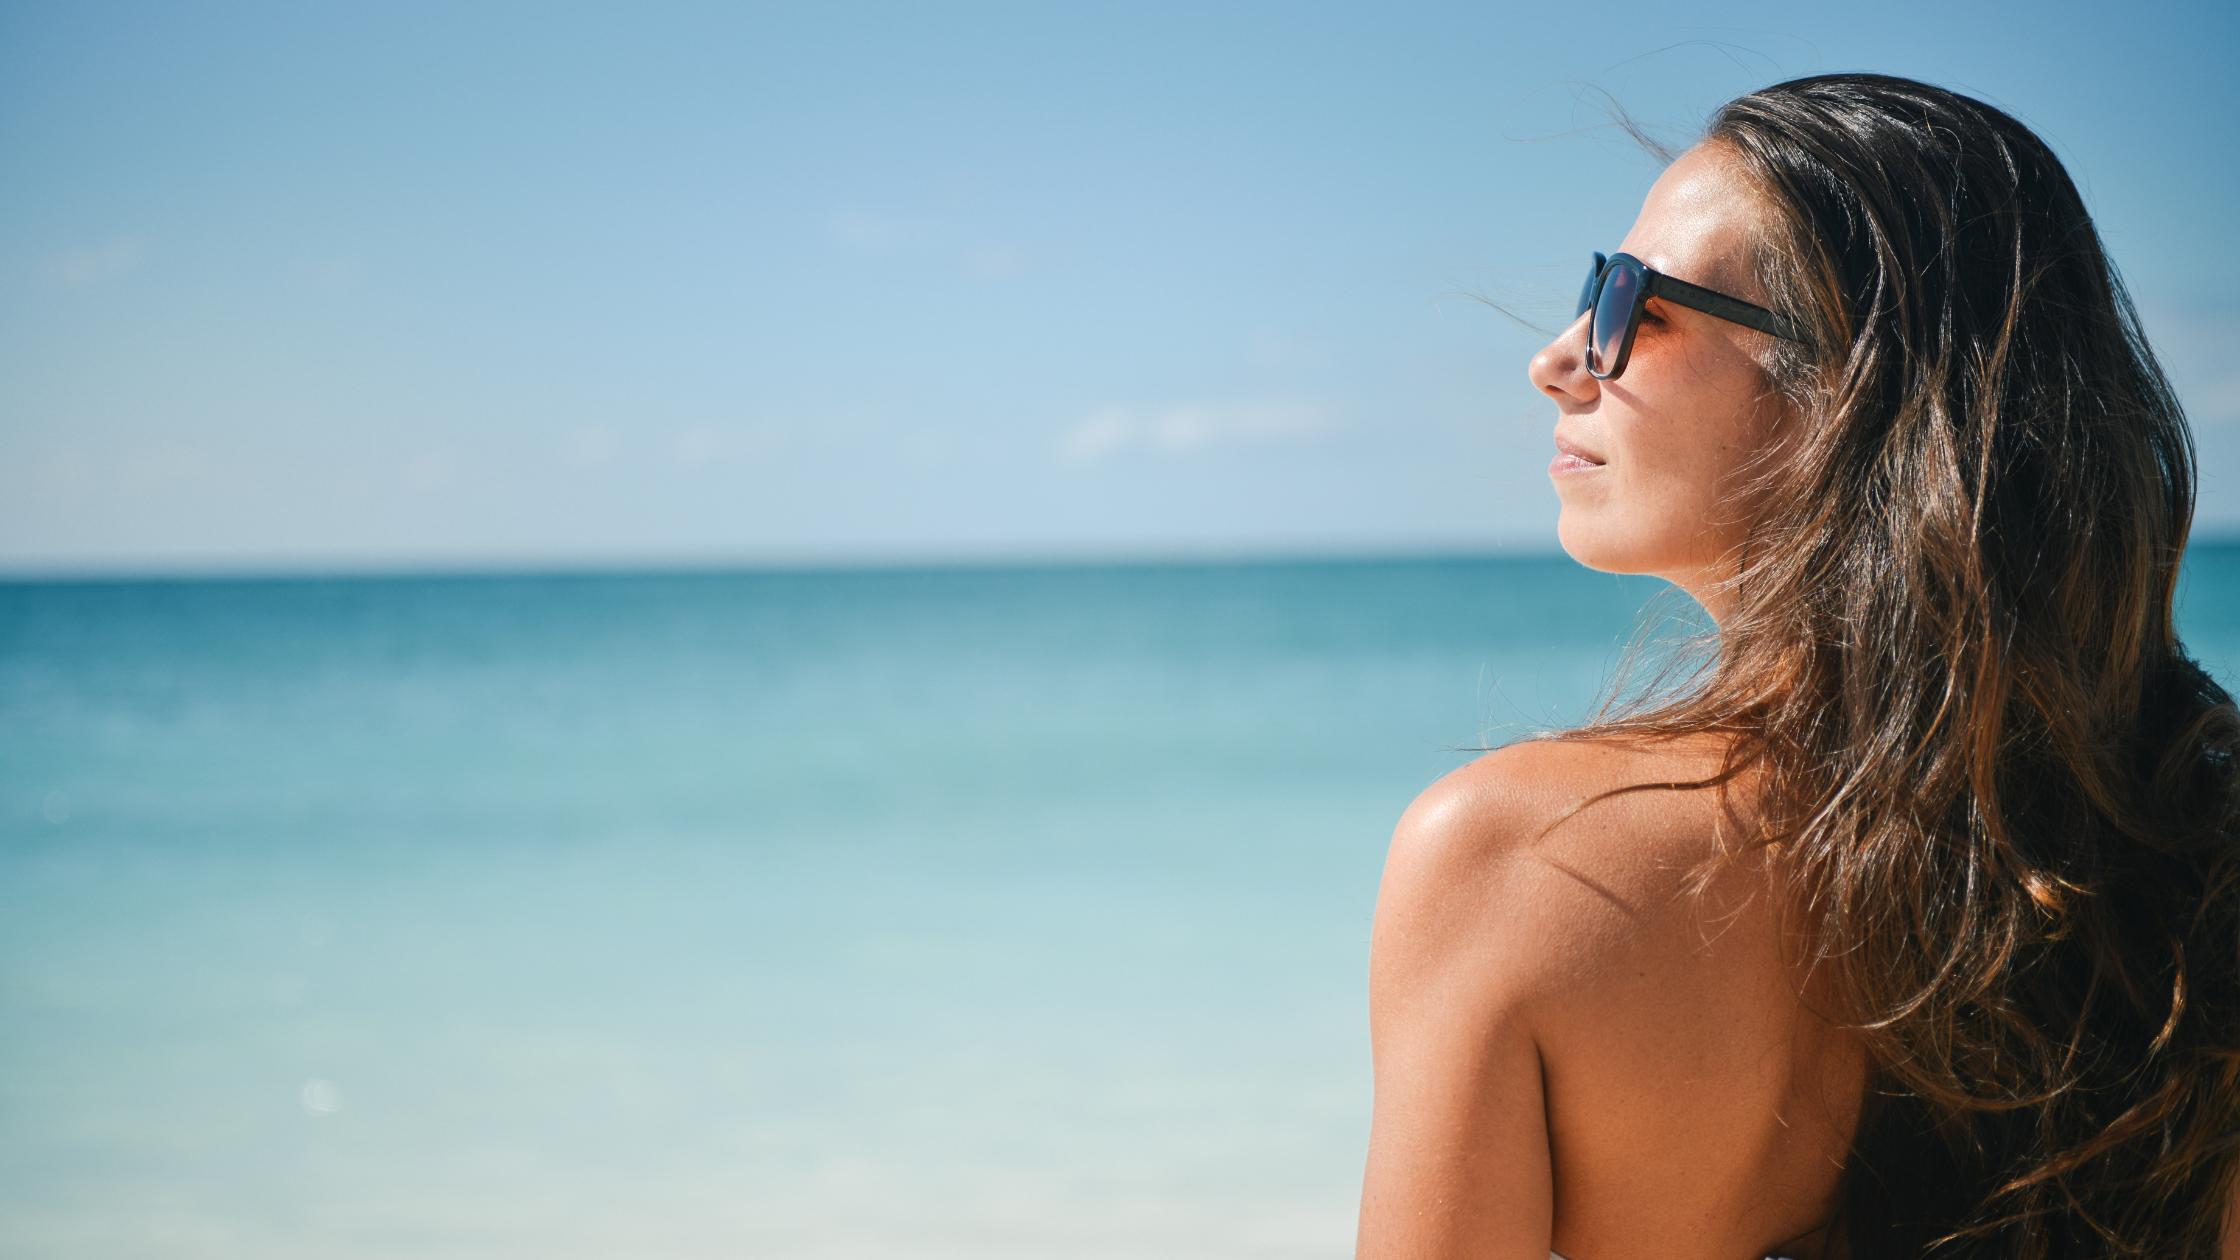 Contact Lenses vs. Glasses 5 Professional Pros Cons 4